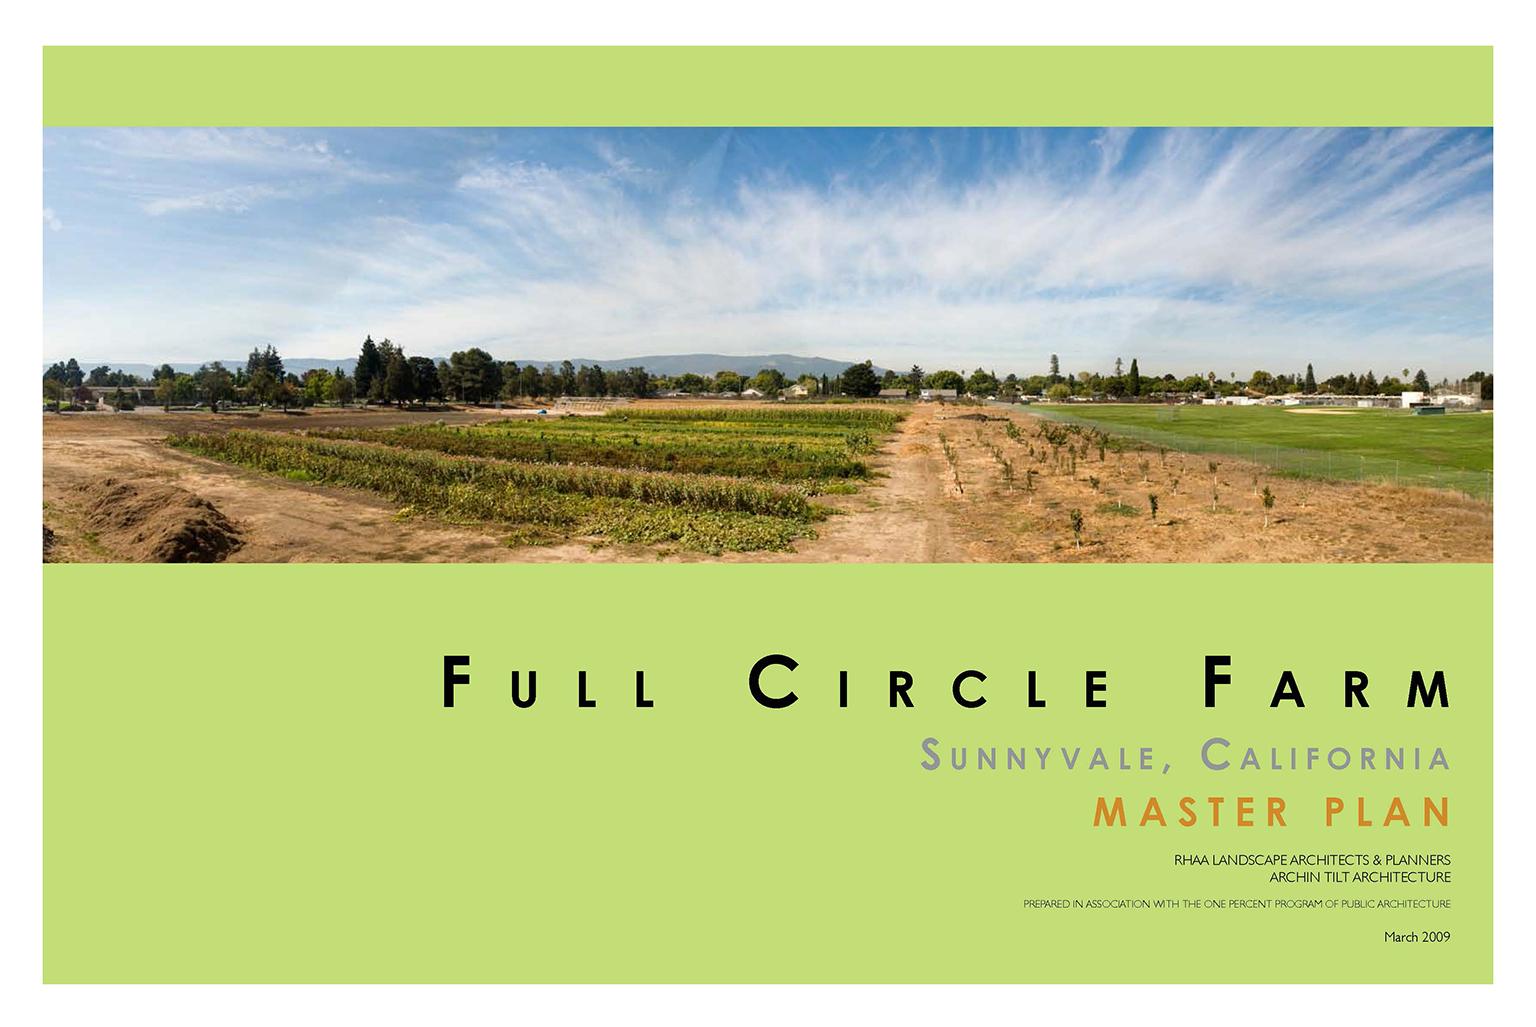 Full Circle Farm Master Plan